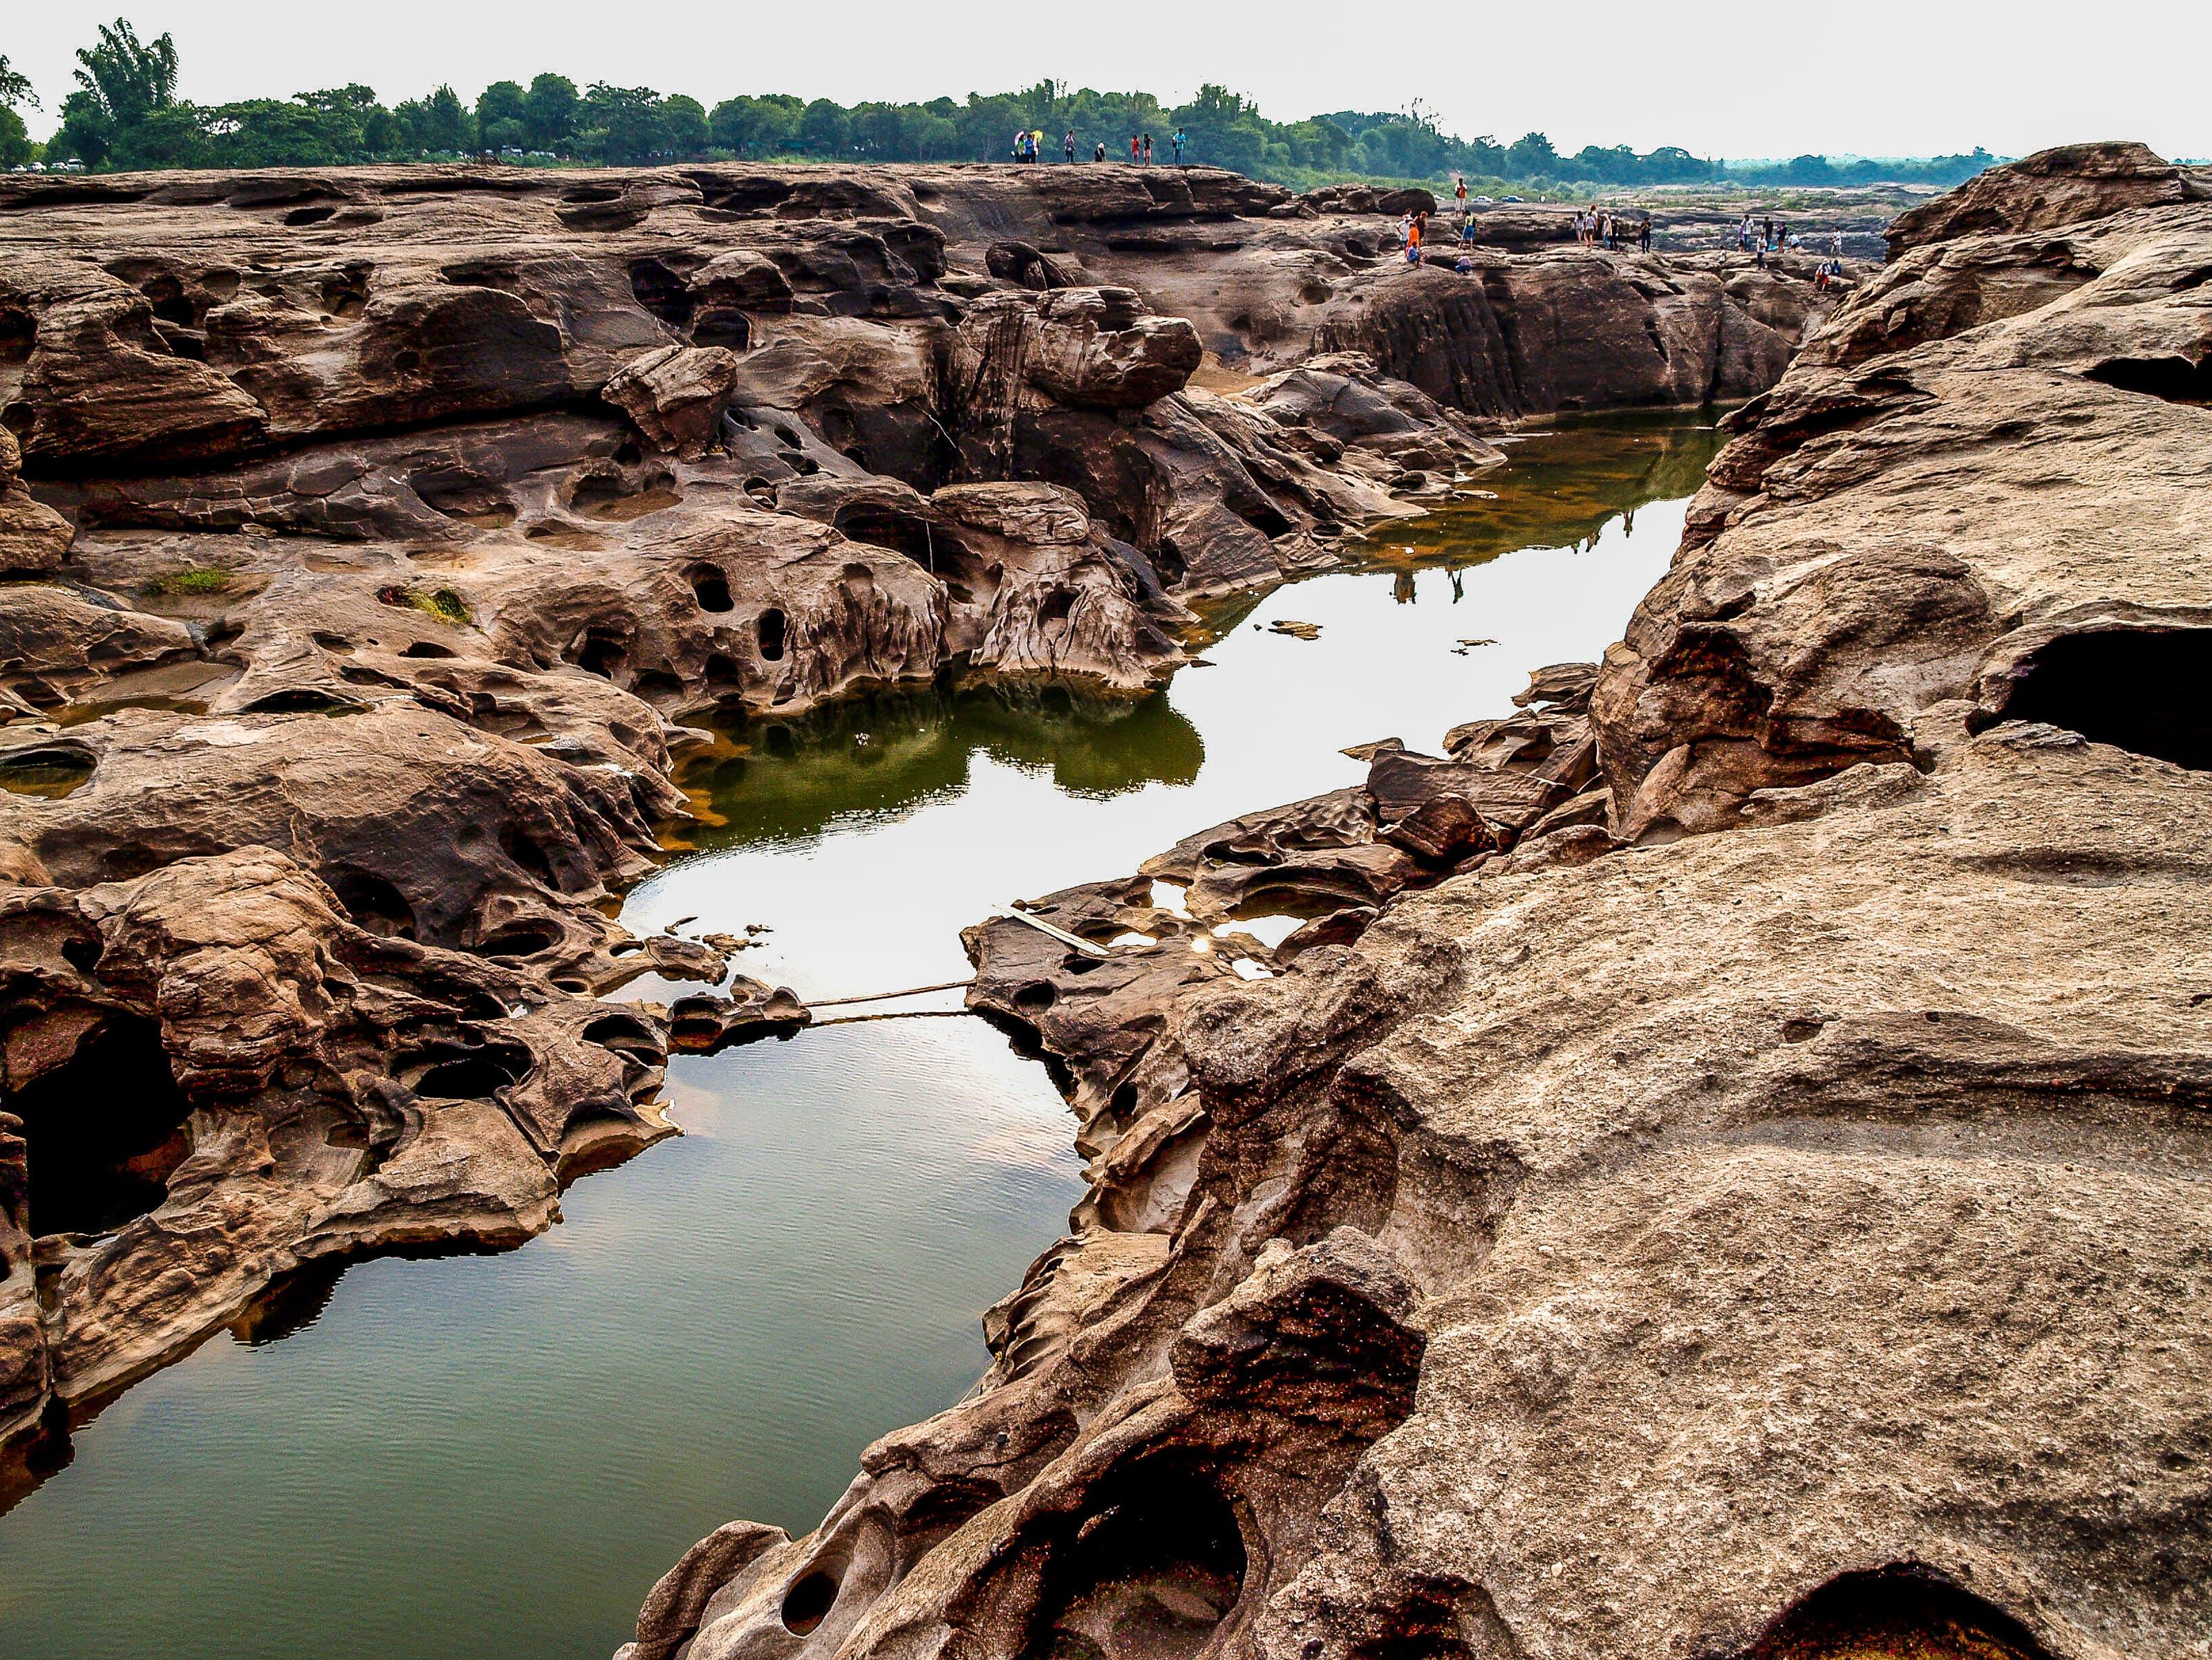 Body of Water in Between Rock Formation